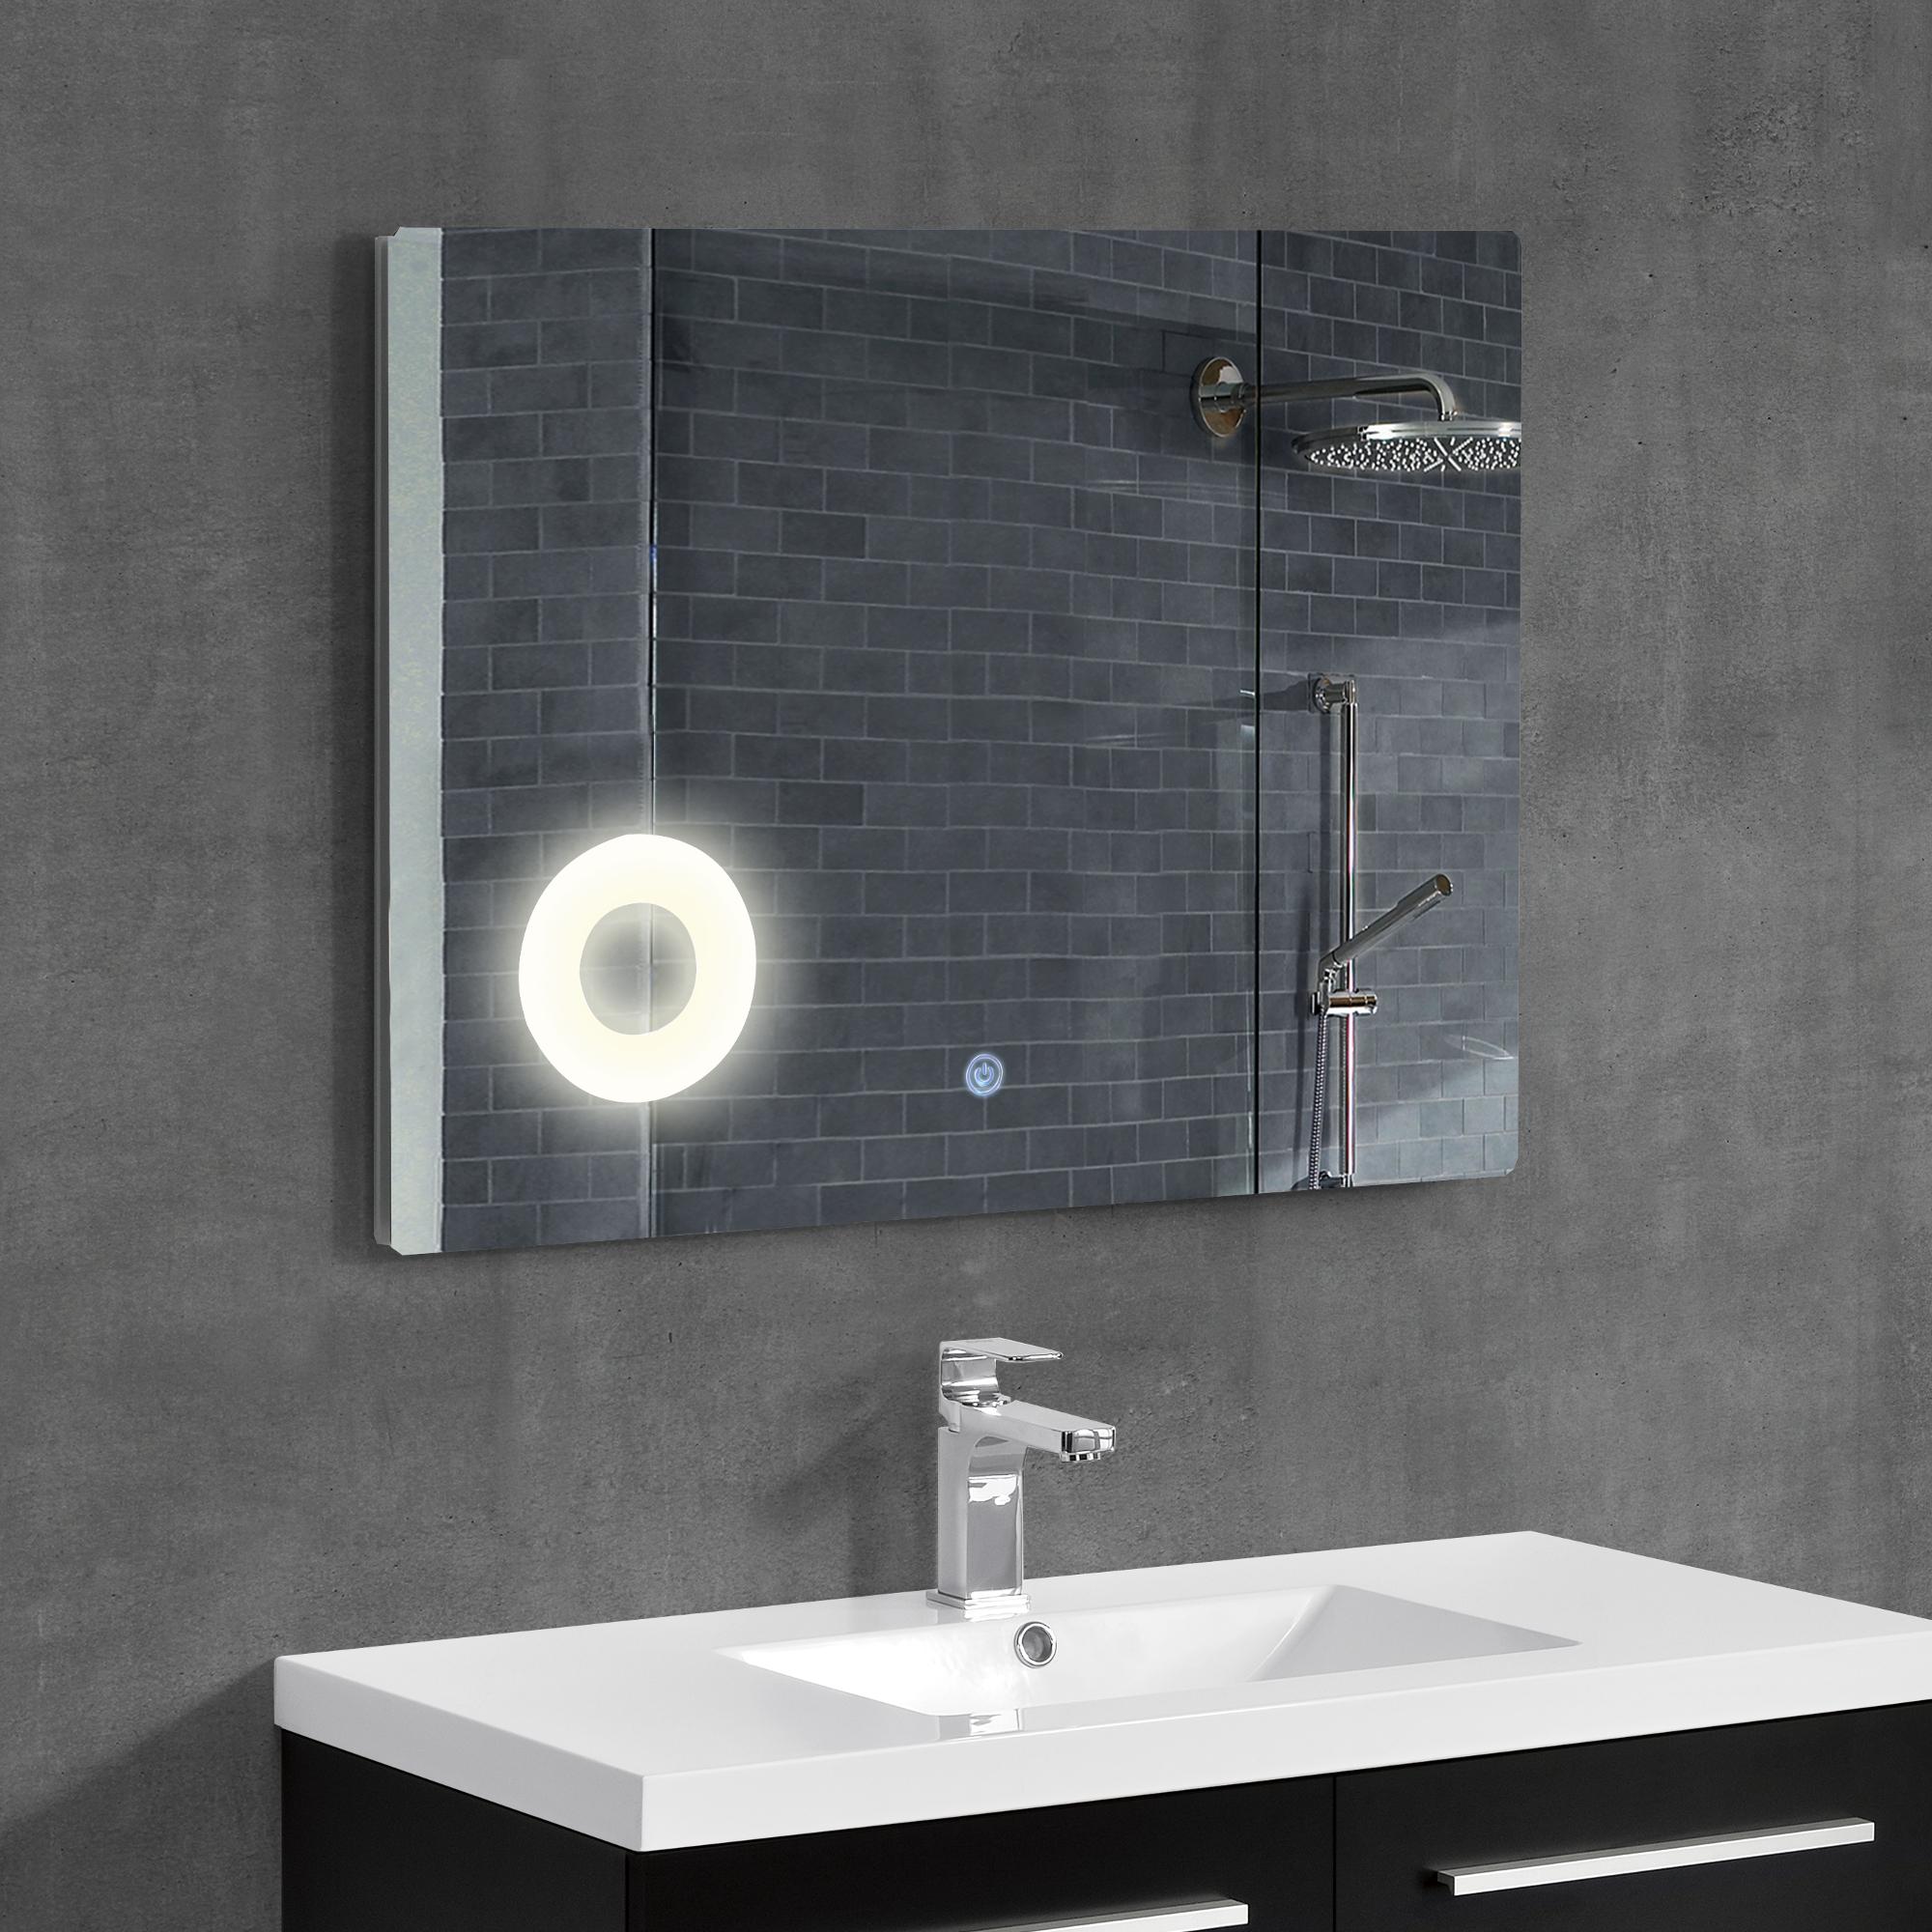 led badezimmerspiegel wandspiegel spiegel kosmetikspiegel 50 x 70 cm ebay. Black Bedroom Furniture Sets. Home Design Ideas